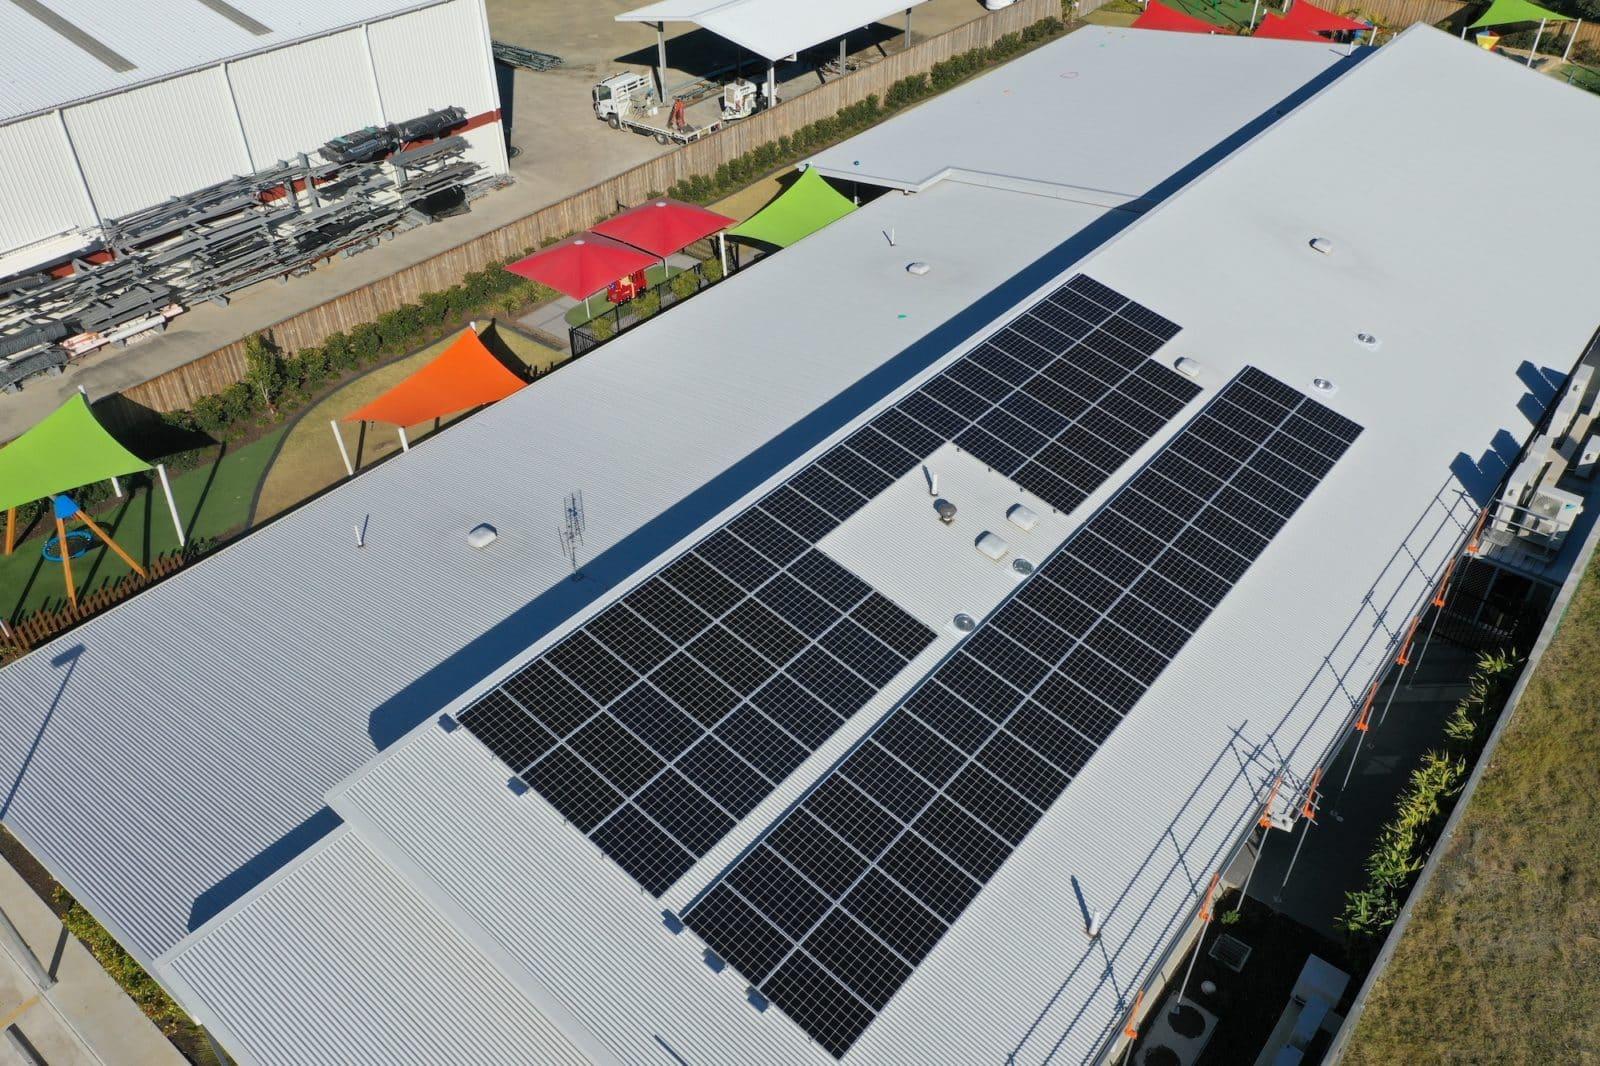 aztech-solar-panel-installation-in-newcastle.